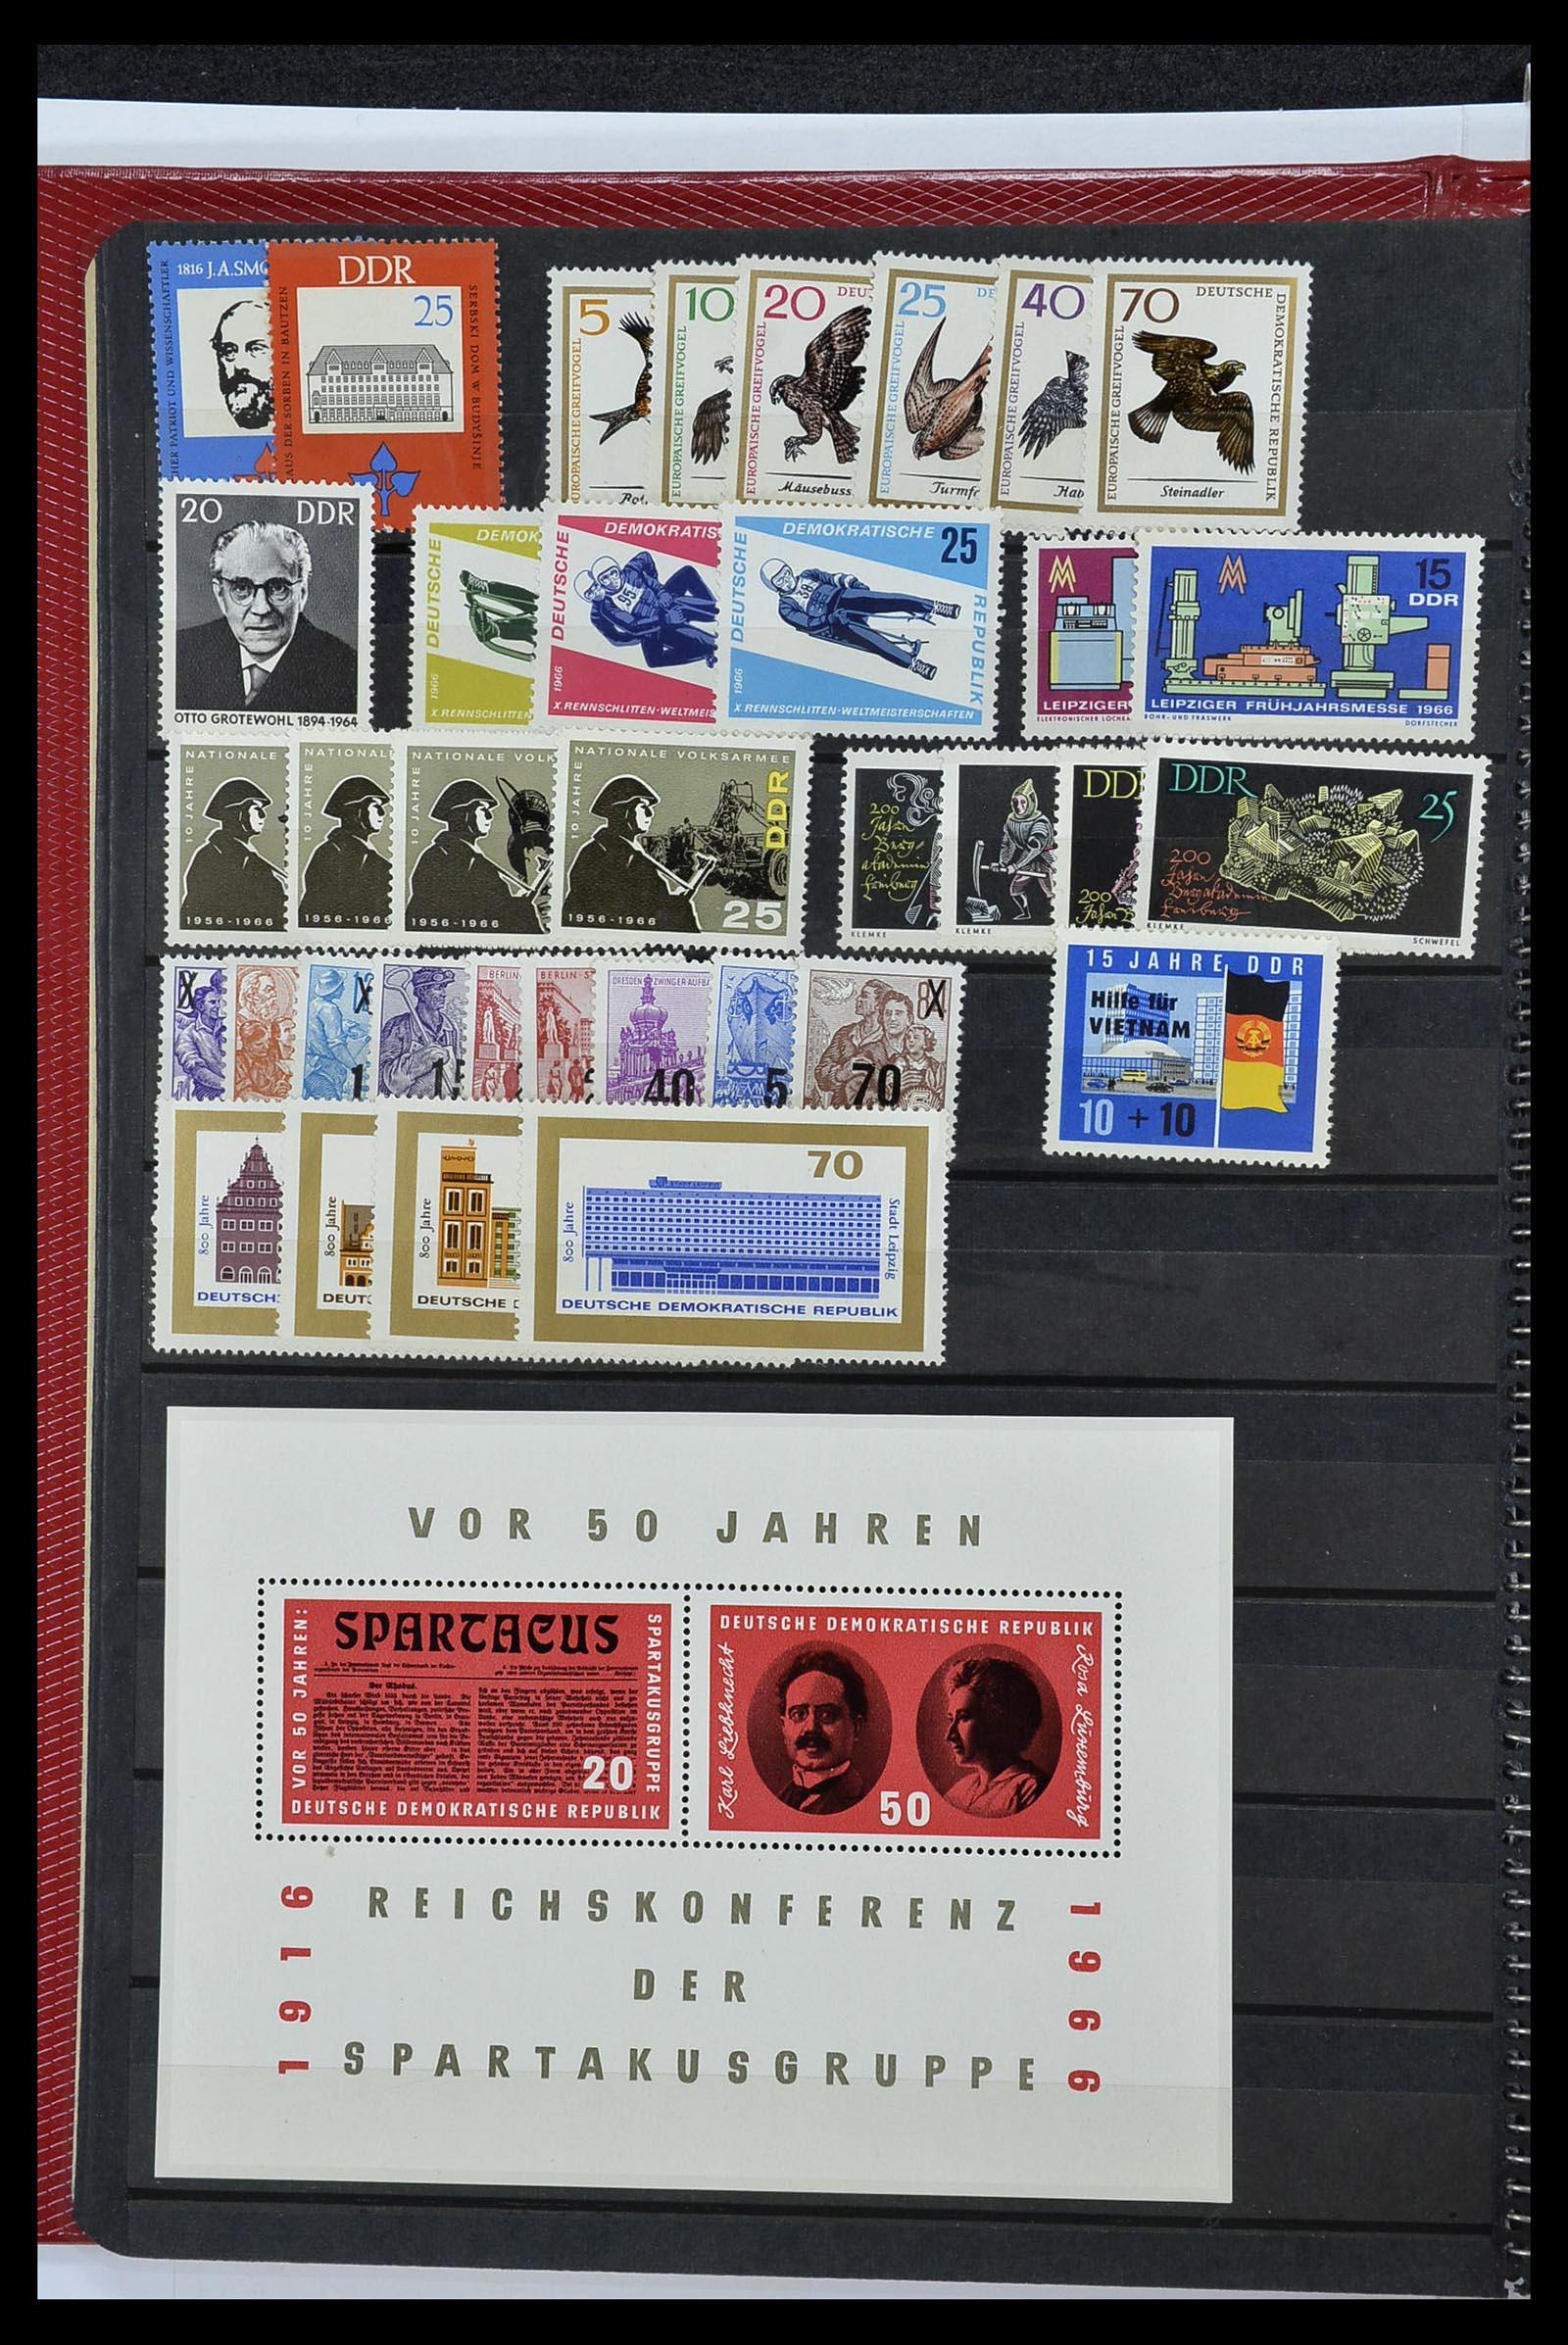 34169 004 - Postzegelverzameling 34169 Duitsland 1880-1955.